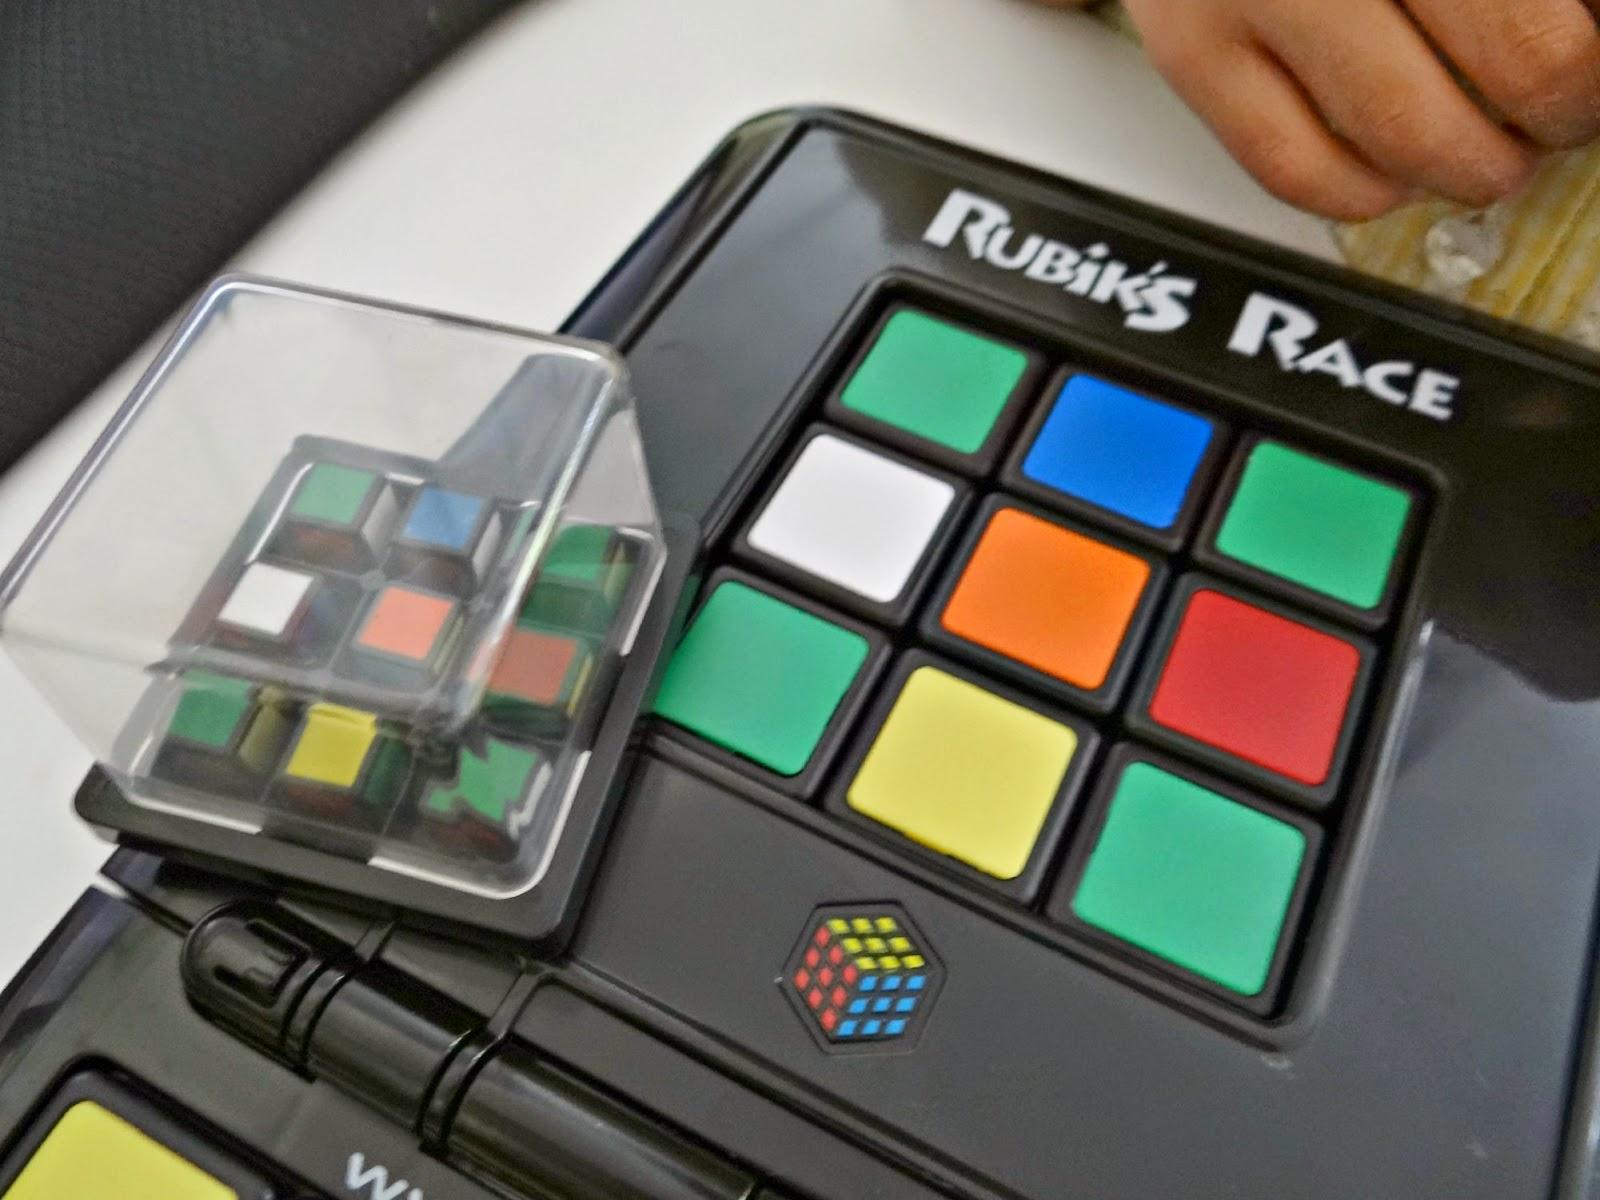 Rubik's Cube, Rubik's Race, Children game